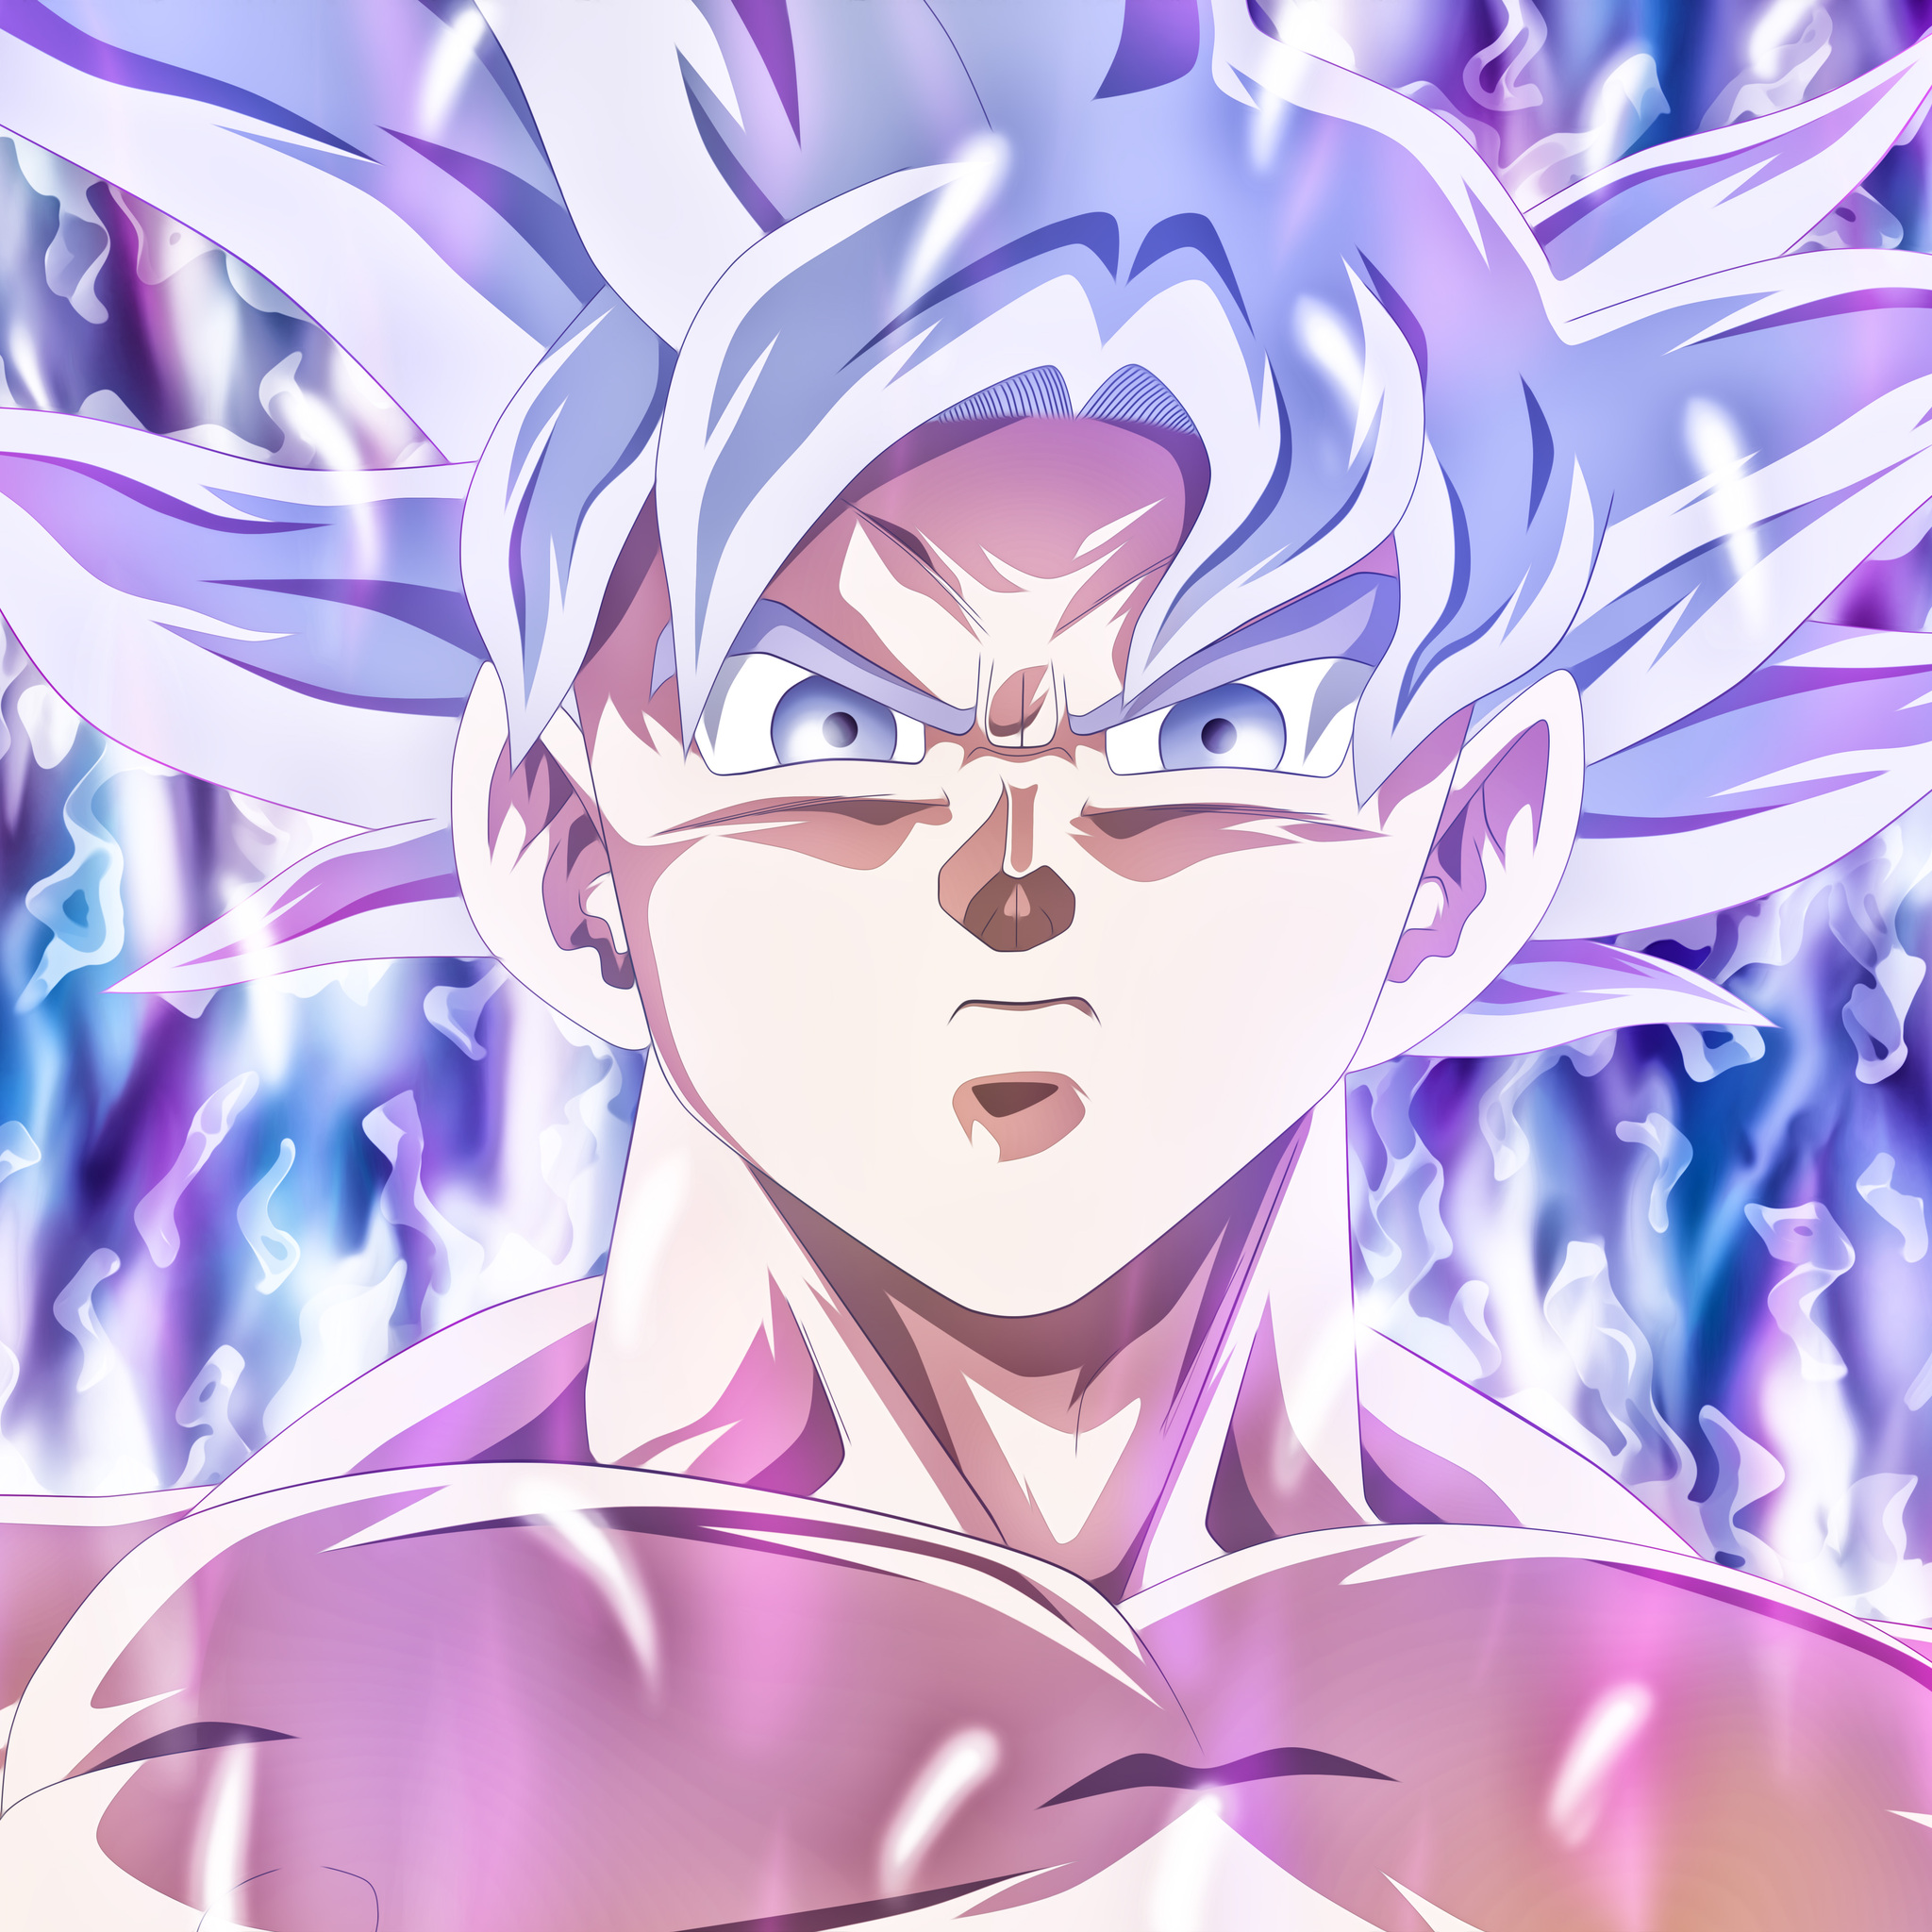 4k Wallpaper Dragon Ball: 2048x2048 Goku Mastered Ultra Instinct Ipad Air HD 4k